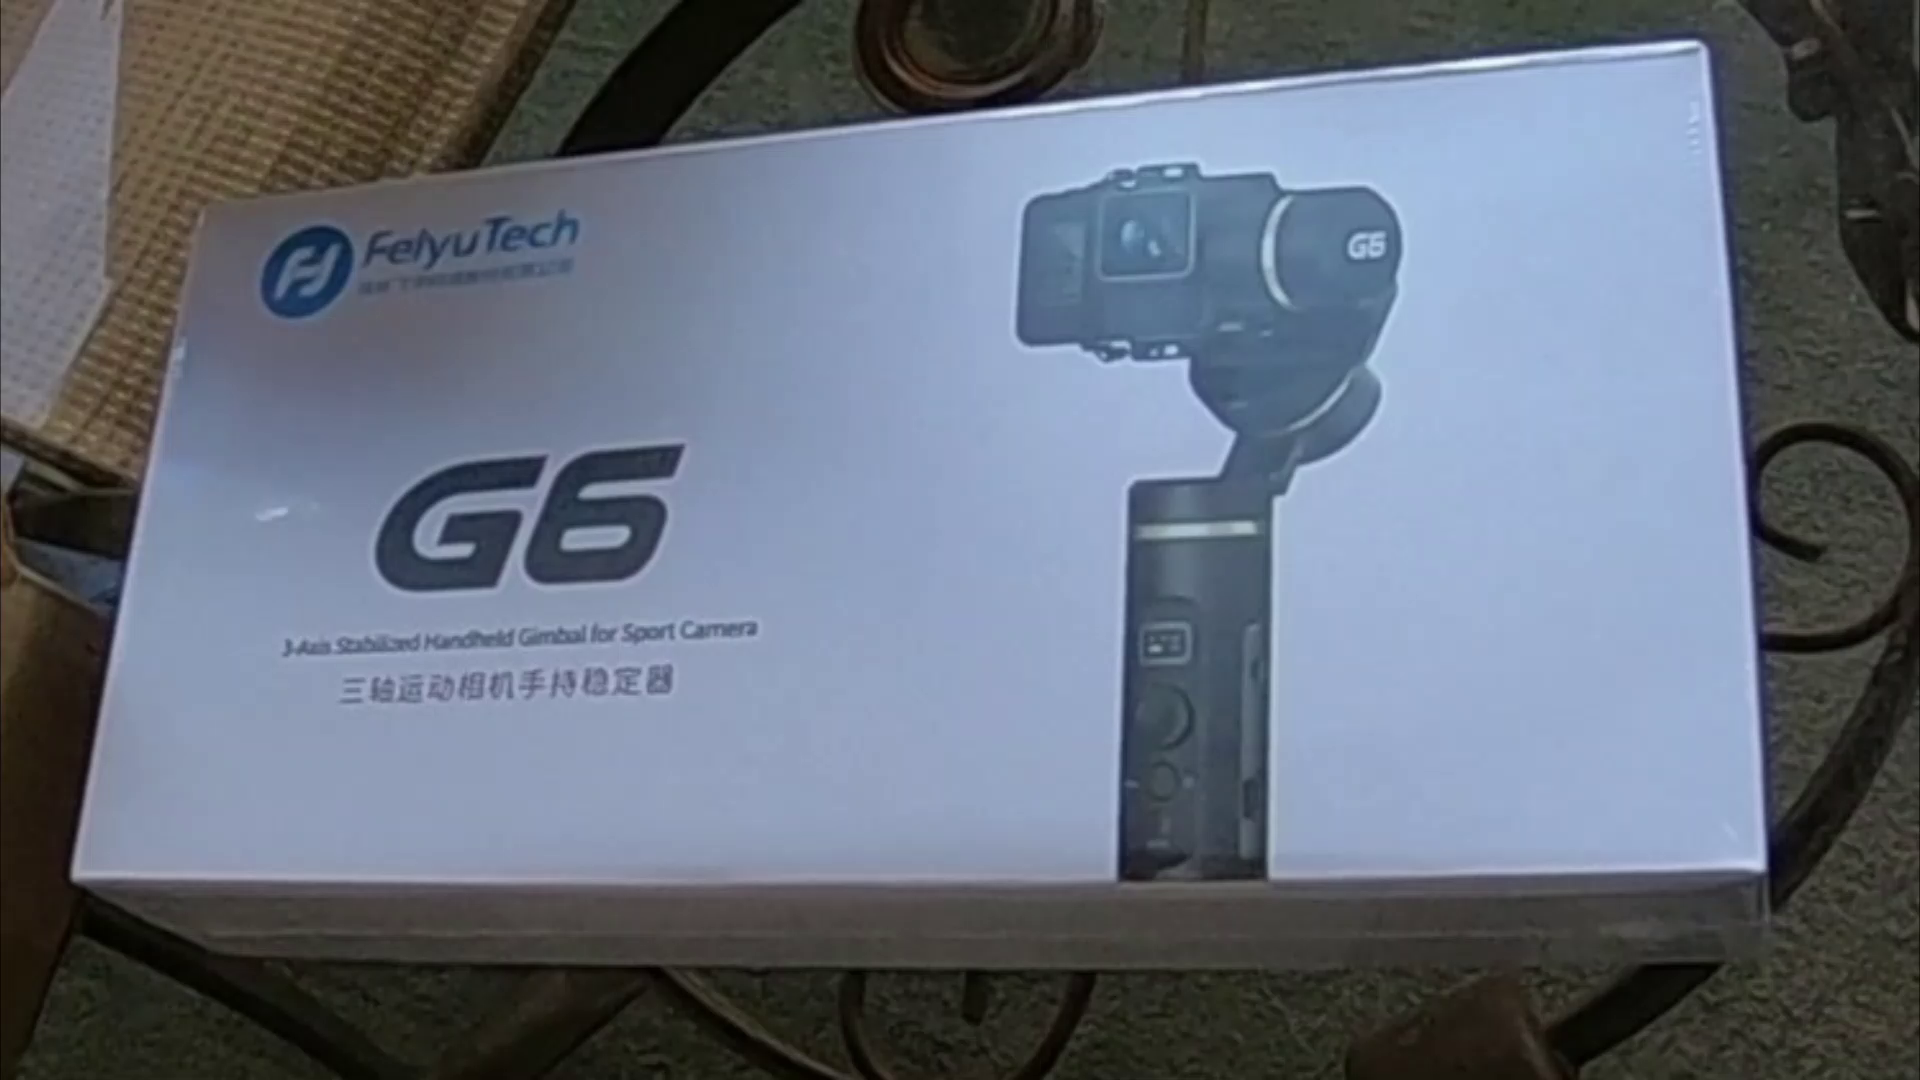 Amazon.com : FY FEIYUTECH Feiyu G6 3-Axis Splash Proof Handheld ...